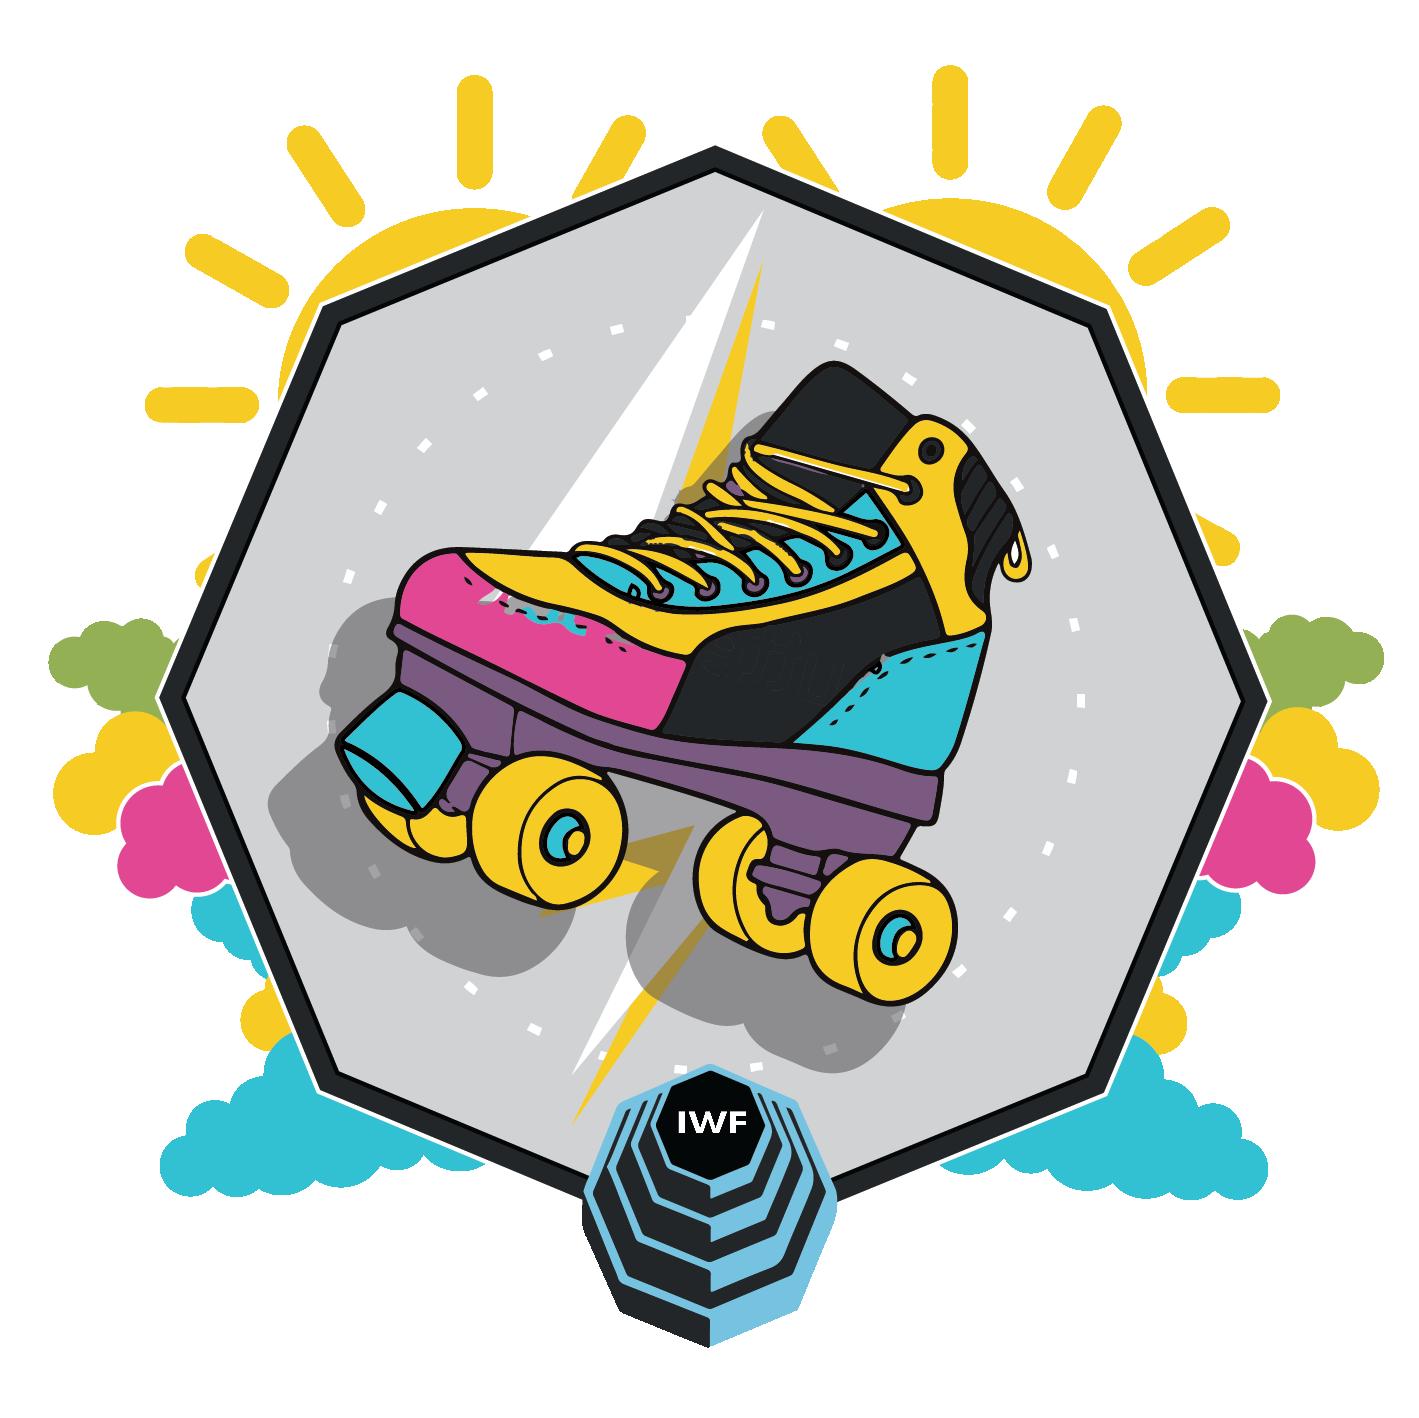 18+ Skate @ IWF Rollerdrome